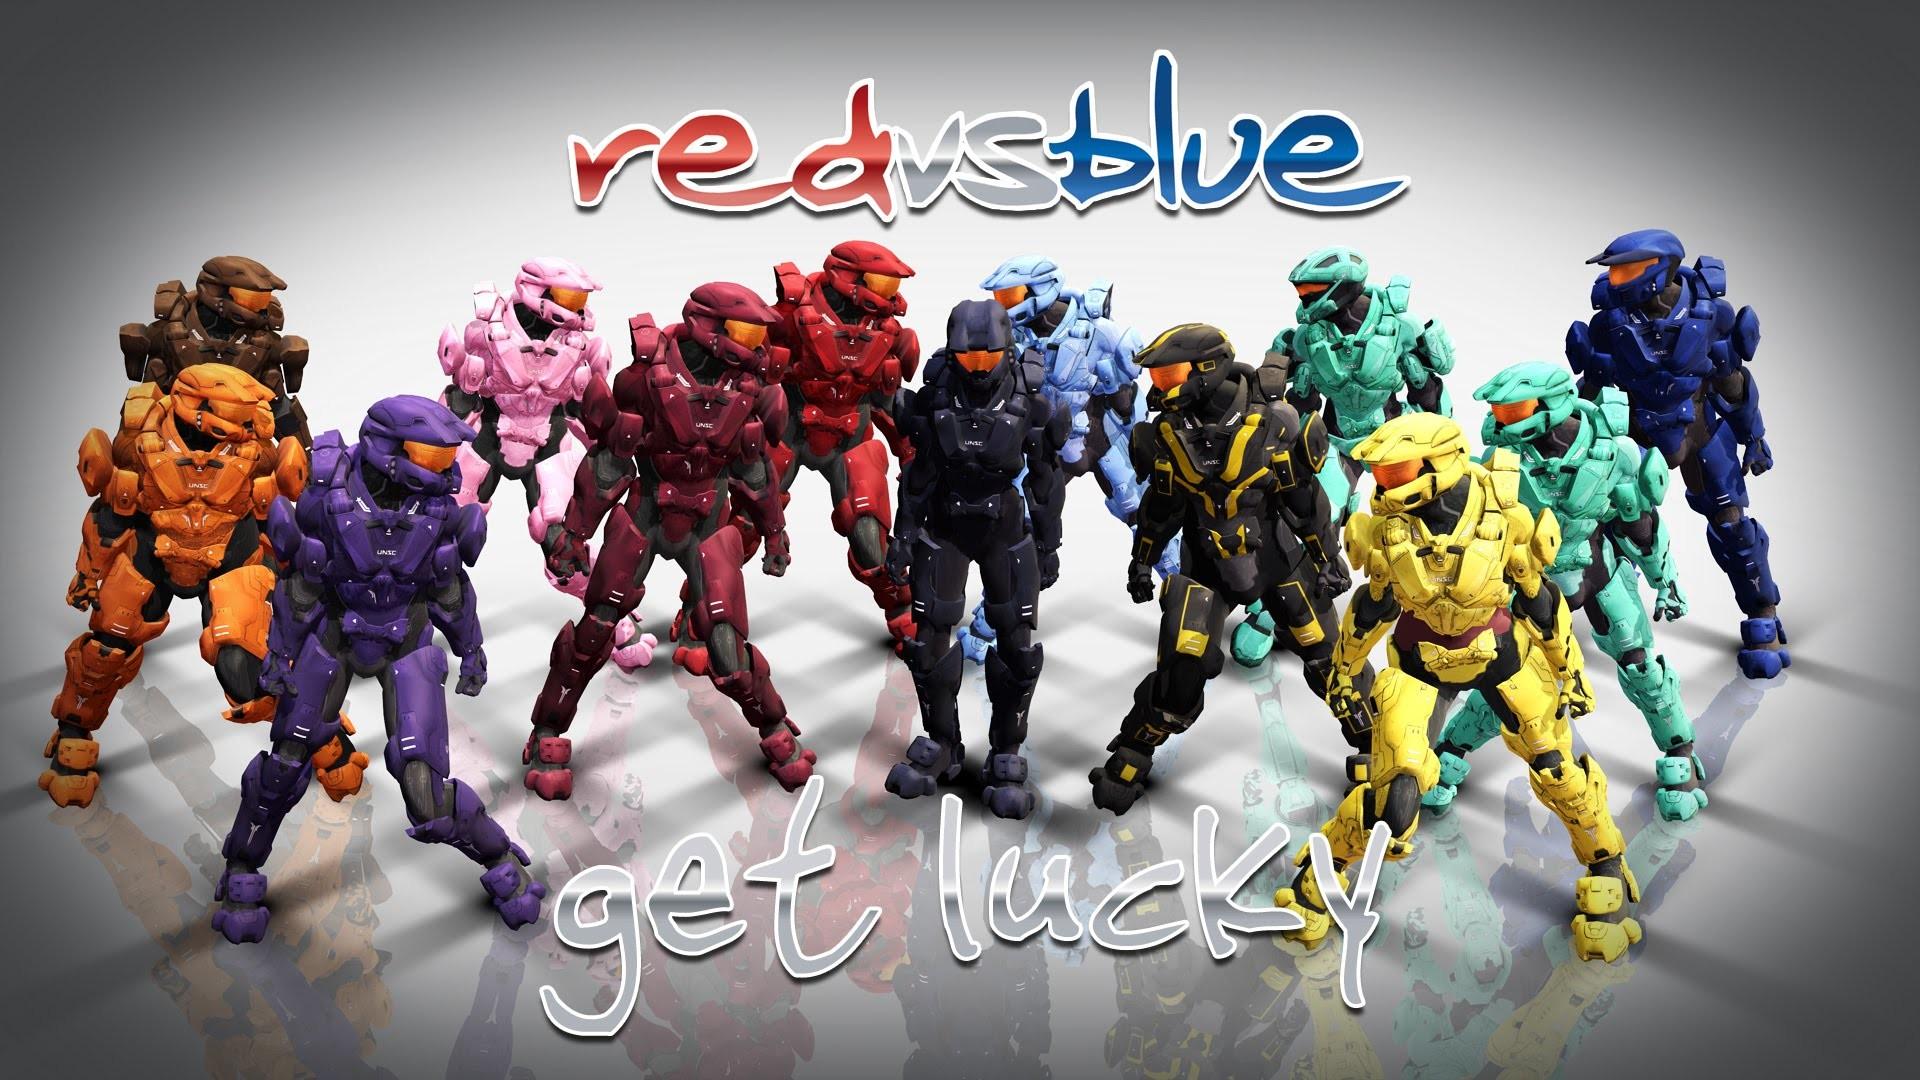 Red vs Blue wallpaper ·① Download free stunning